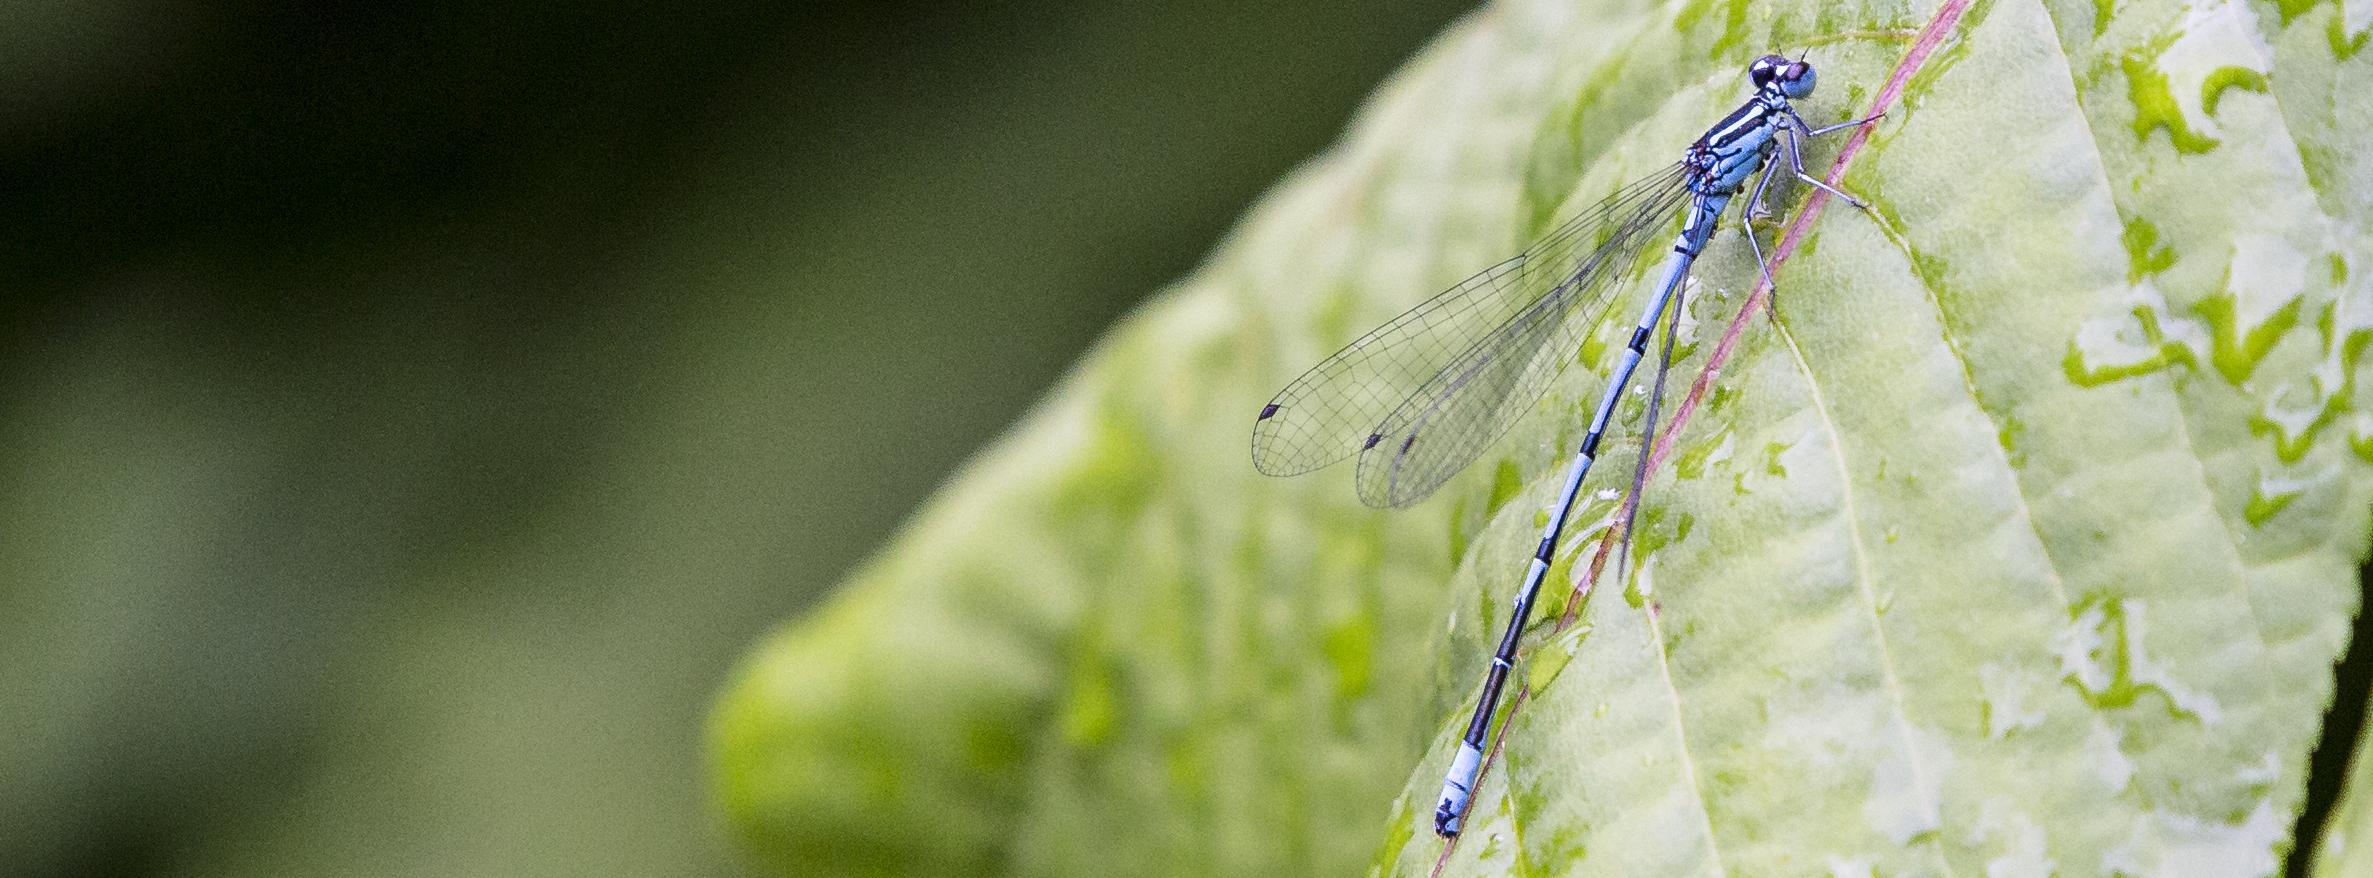 naturaliste-libellules-2015-marie-colette-becker-08